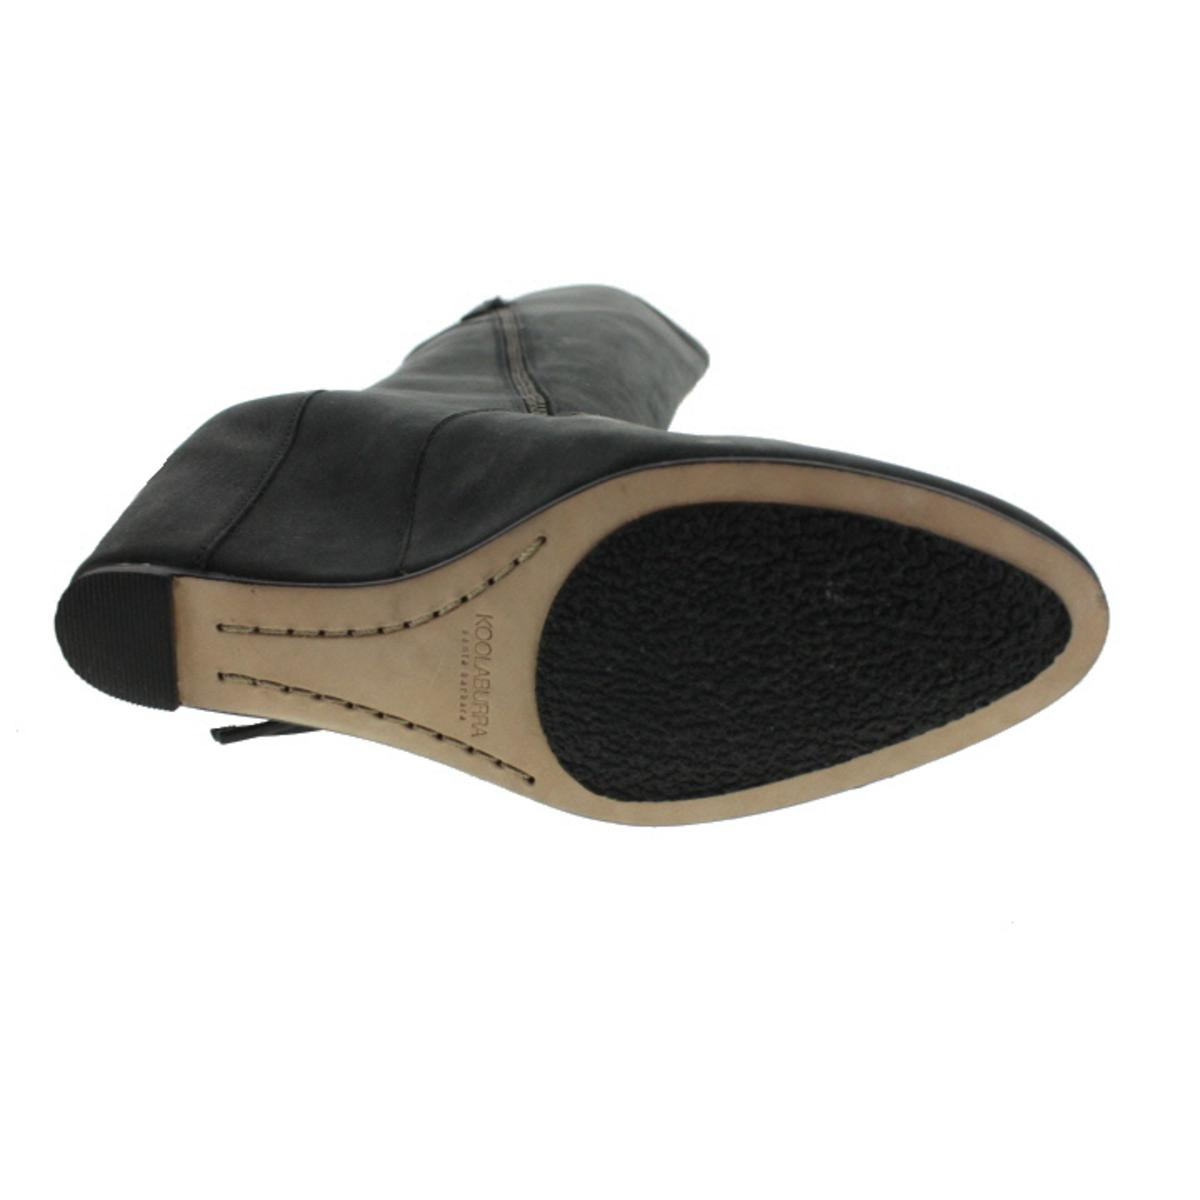 701a06320fd6 Koolaburra - Koolaburra Womens Paradis Leather Fringe Wedge Boots -  Walmart.com